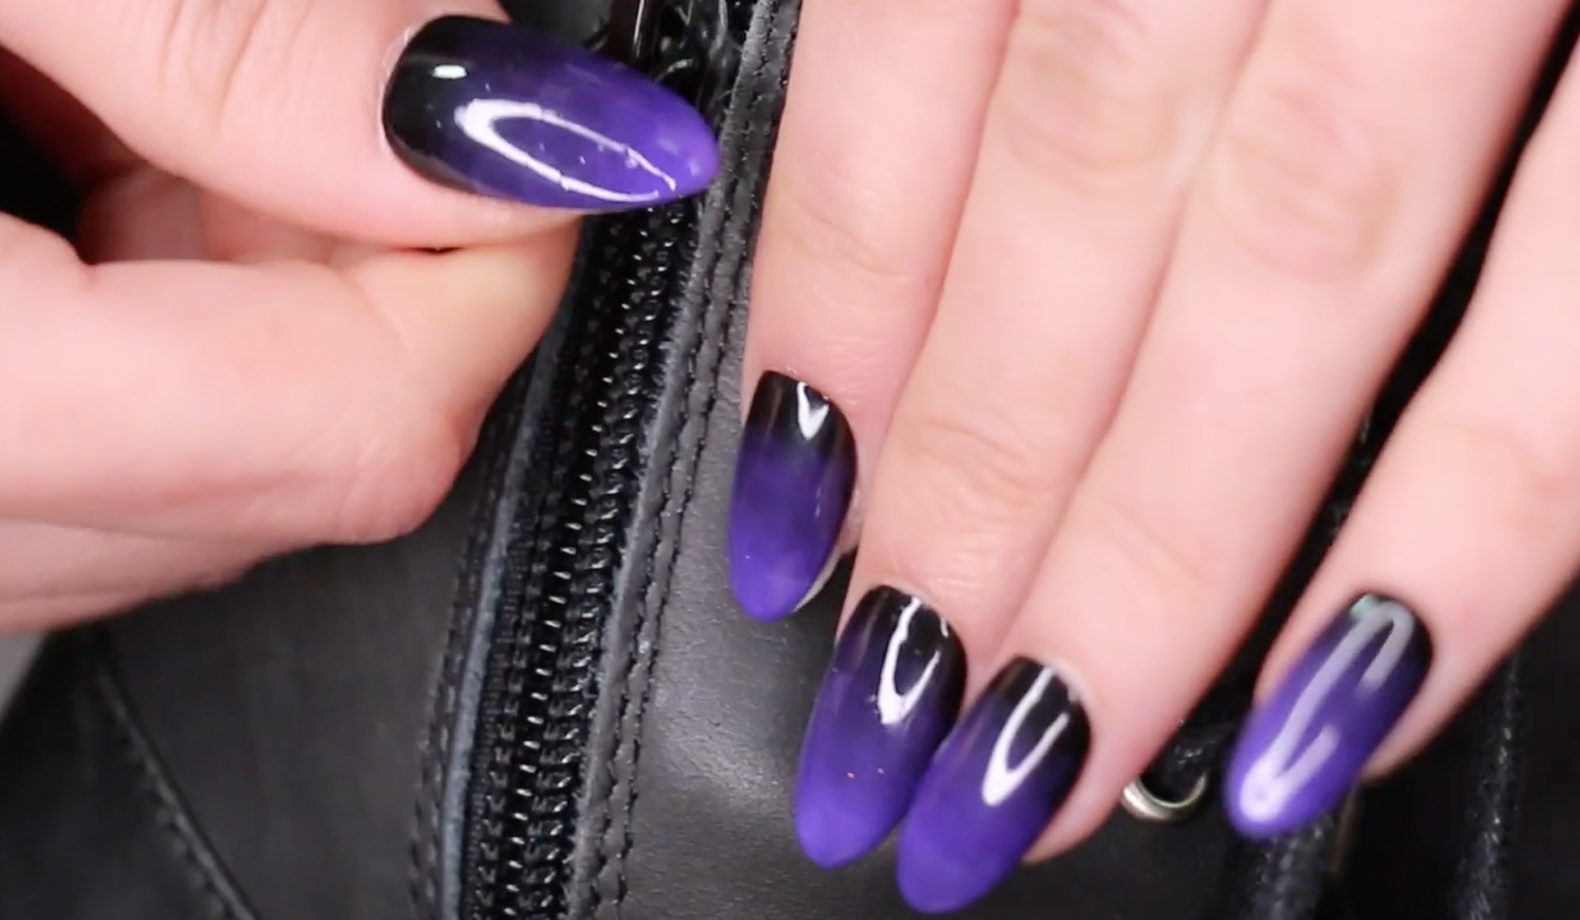 Nail-Apparel-Ombre-Nails-1580x920